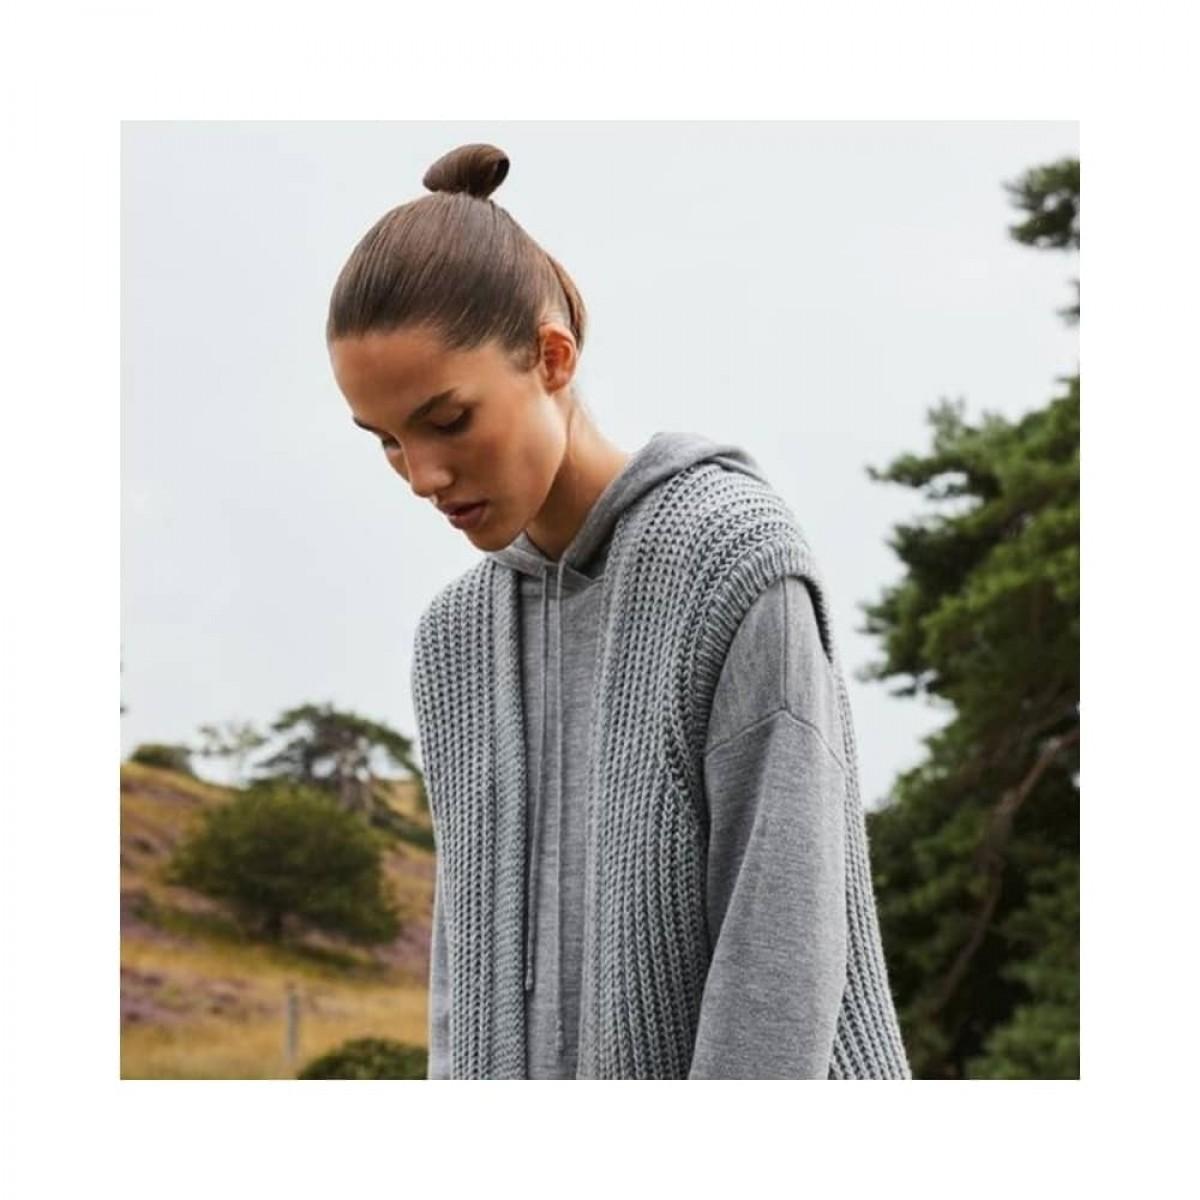 jenna merino hoodie - grey melange - model front